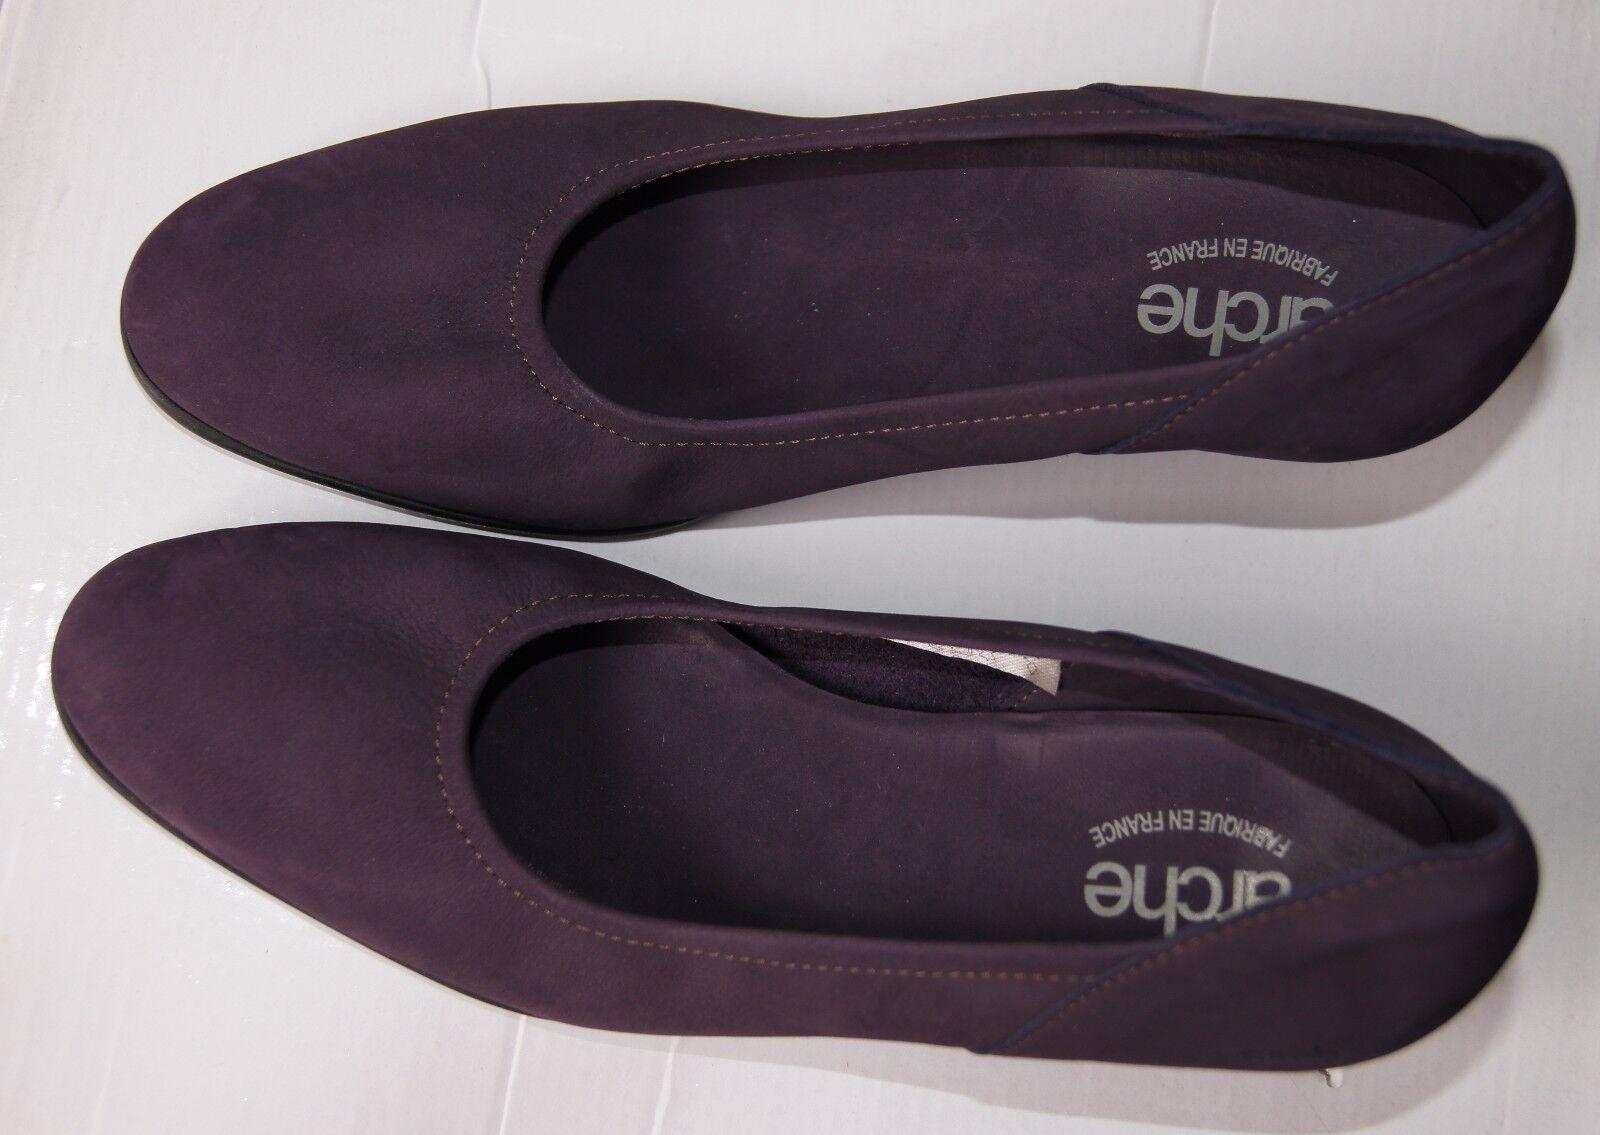 Arche Herys Wedge Court Schuhe Leder In Cassis Nubuck Leder Schuhe bf6221